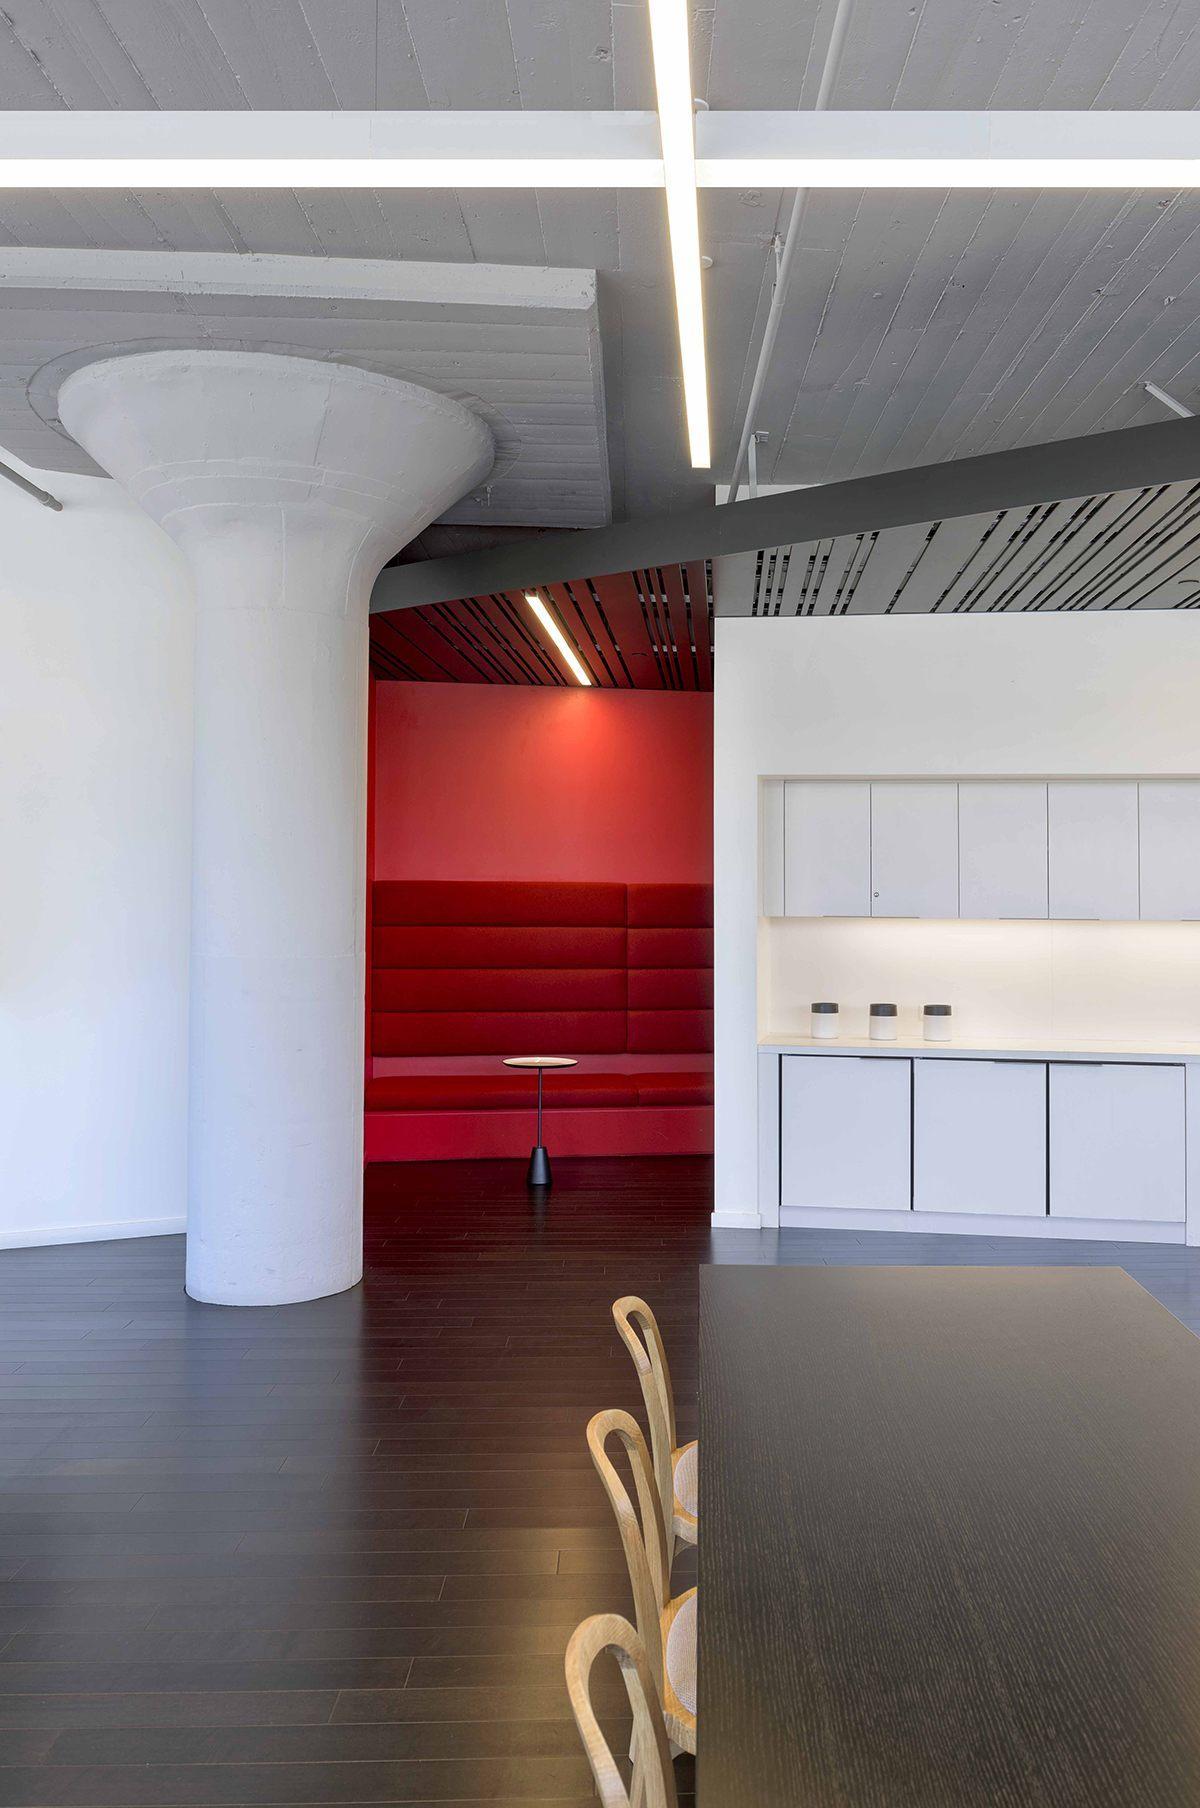 wired-office-gensler-11